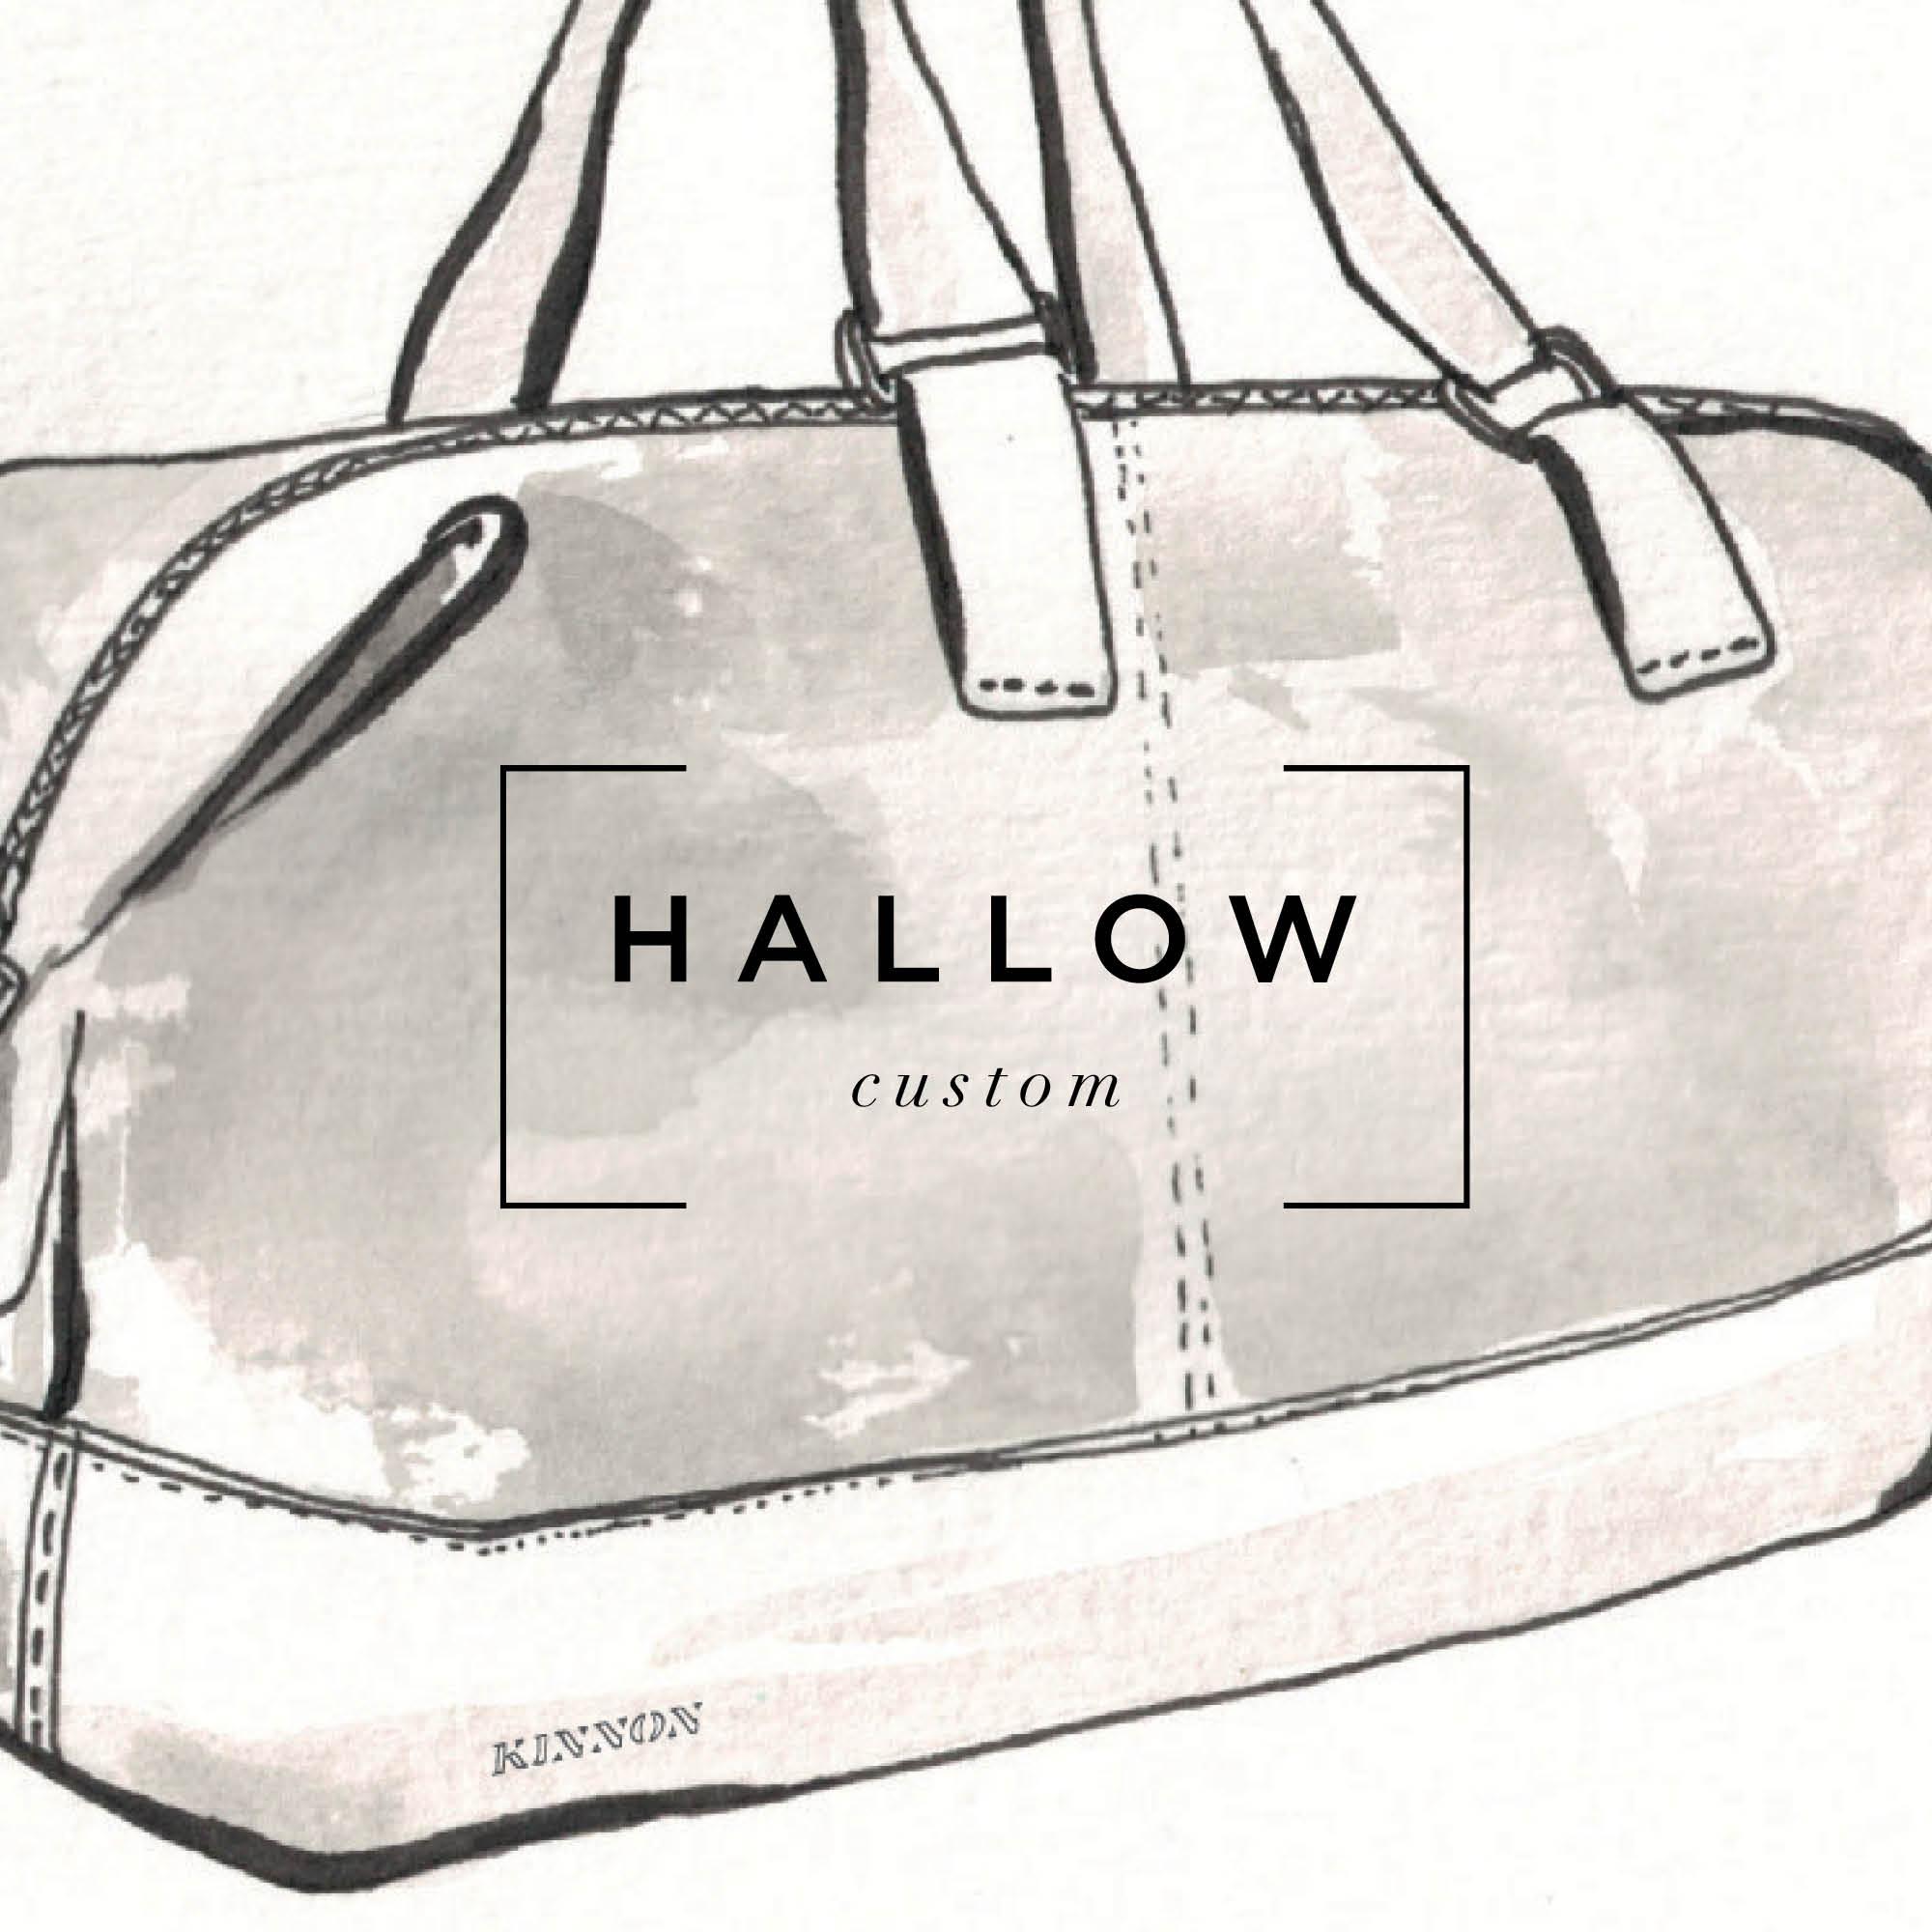 hallow custom tile.jpg